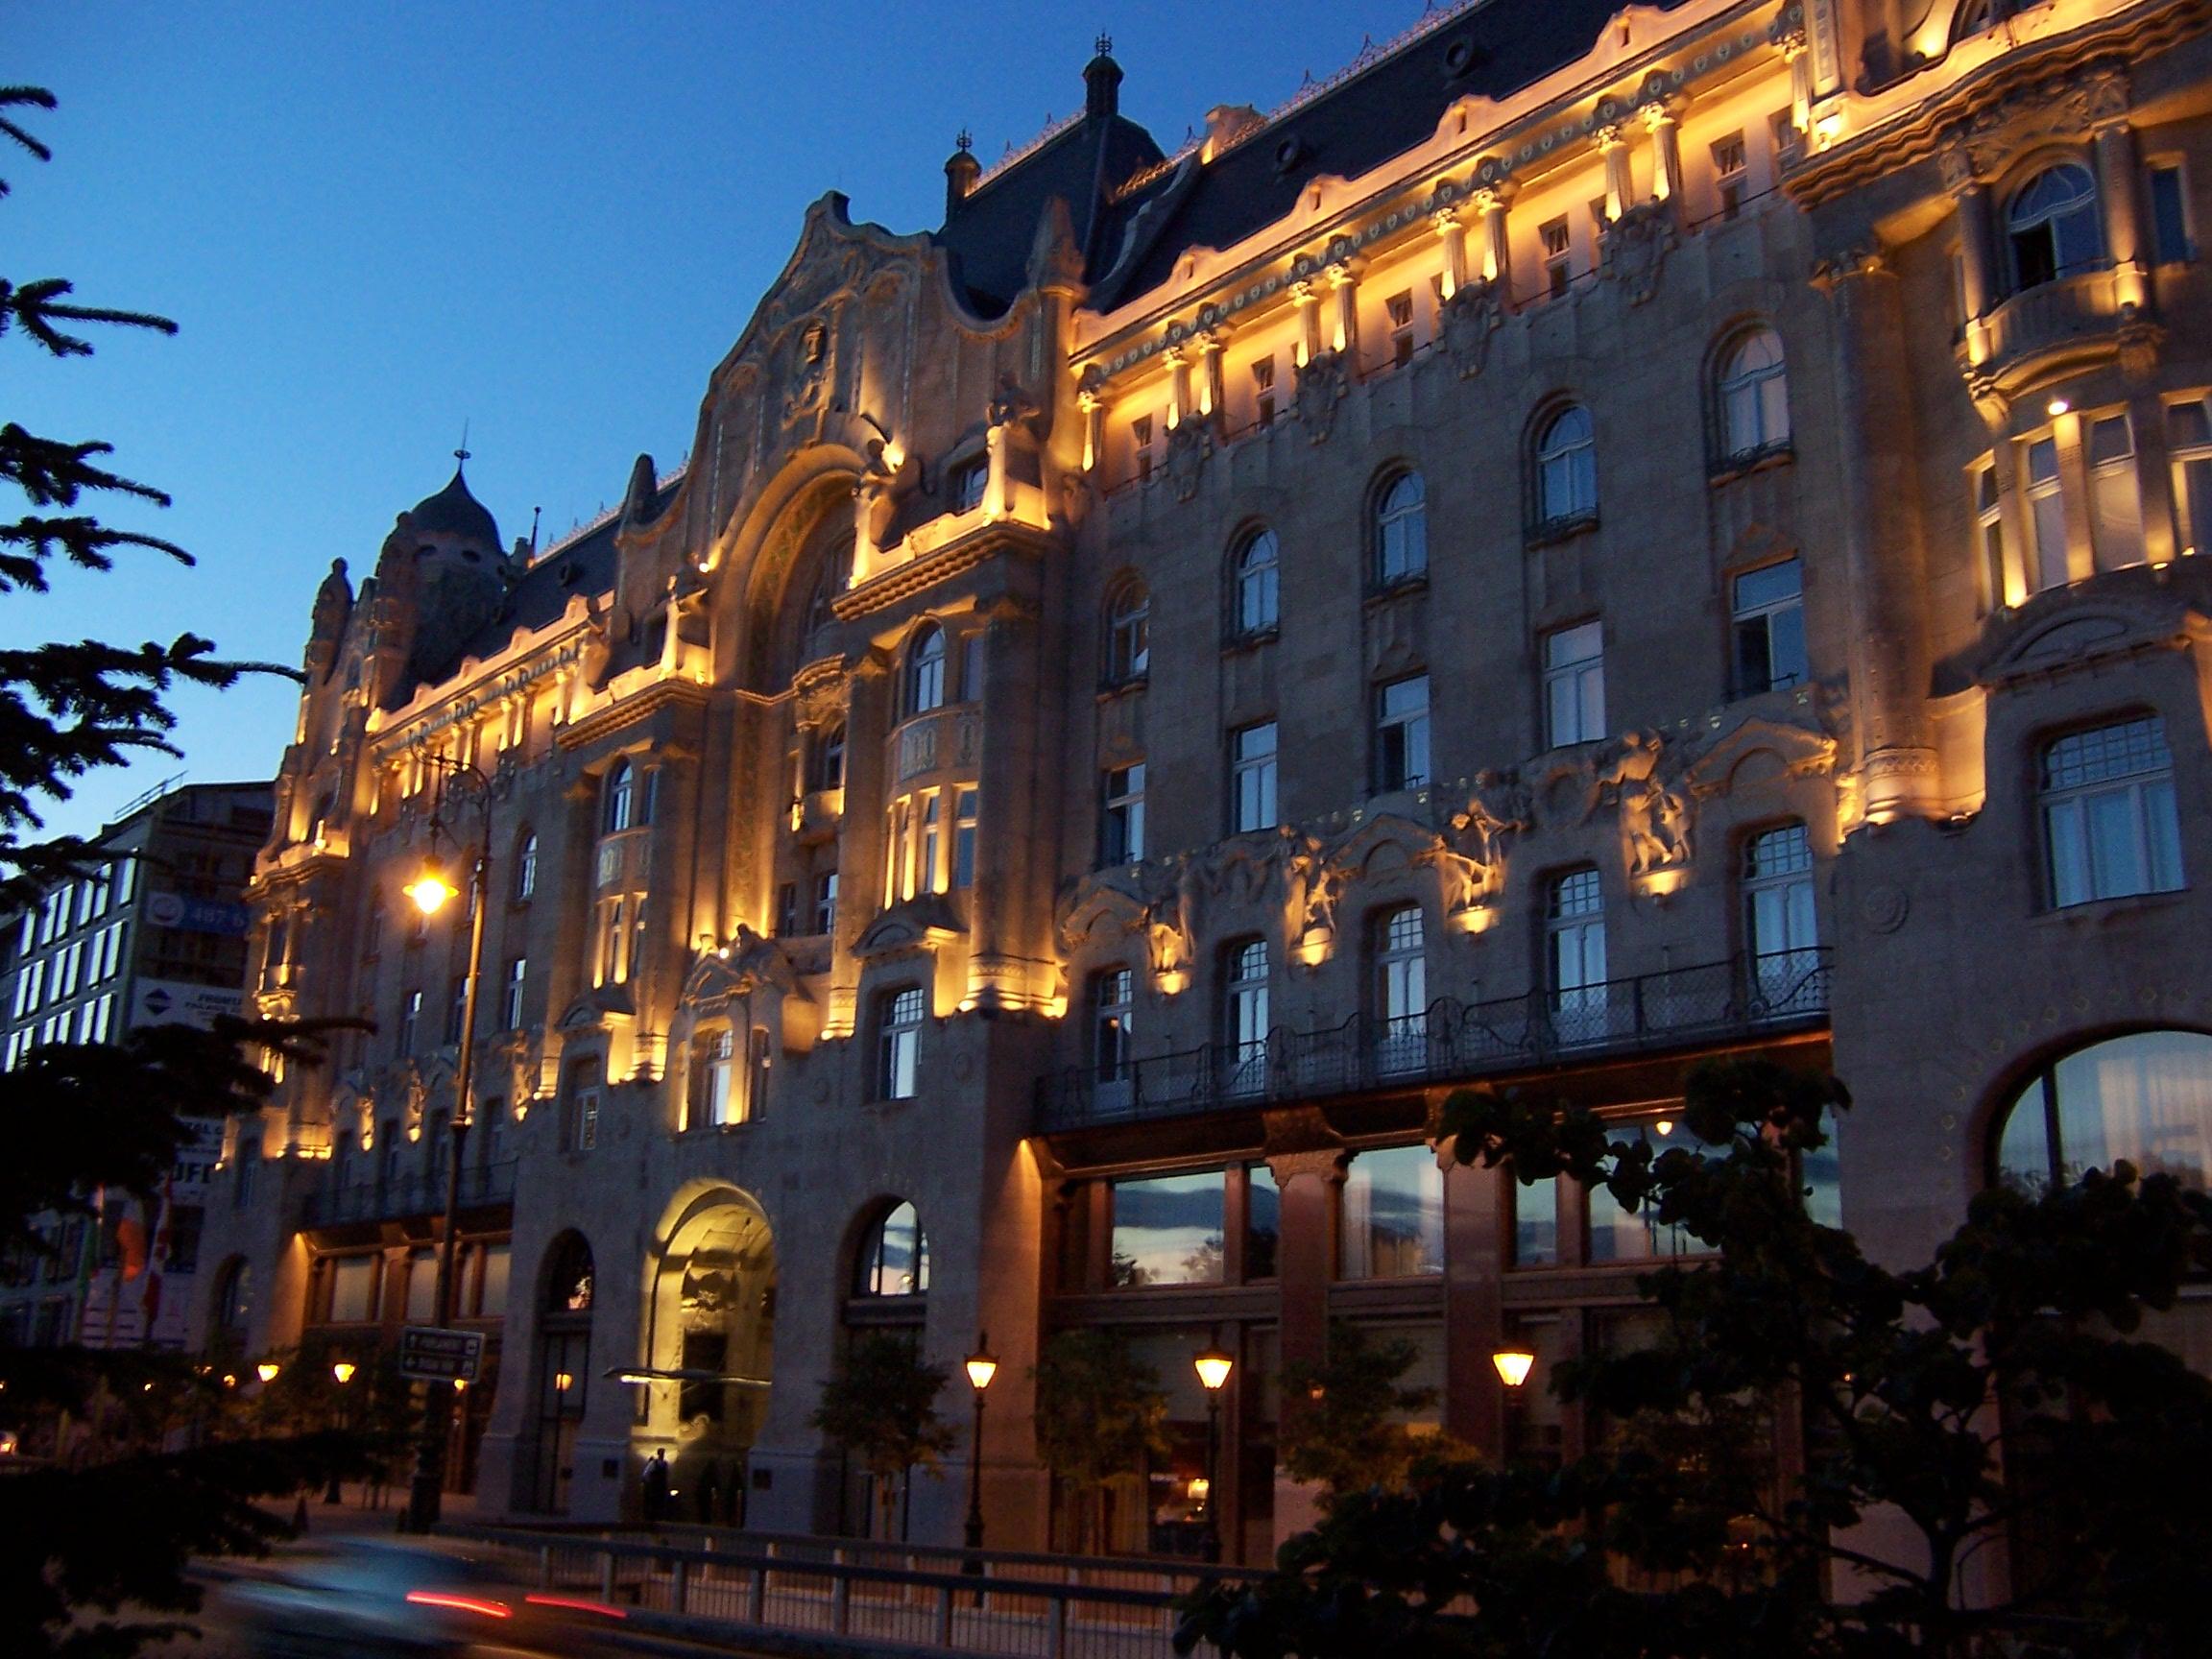 File:Budapest gresham lights.JPG - Wikimedia Commons